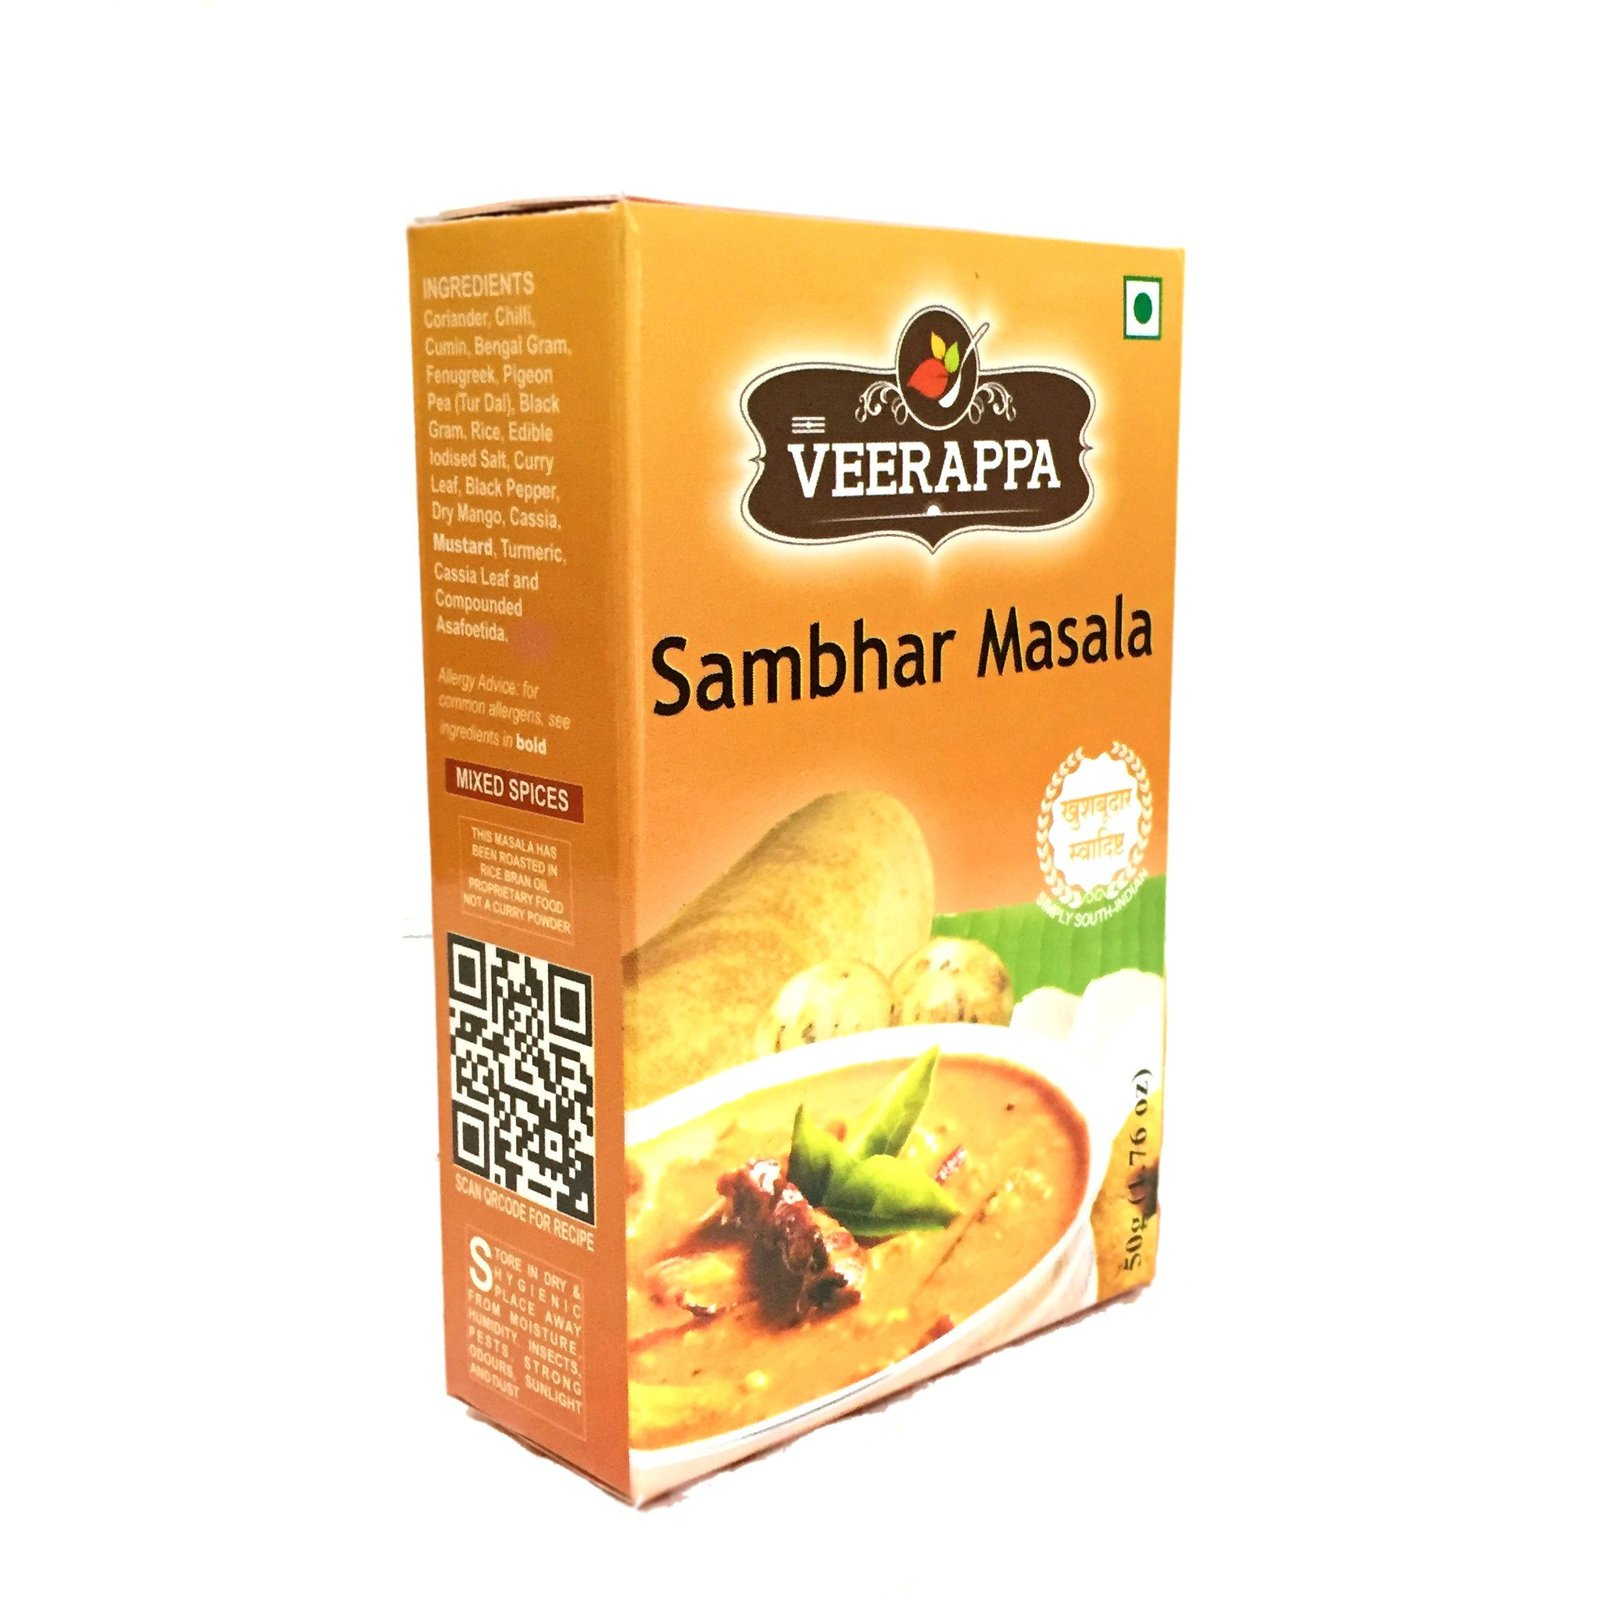 Snack Masala Box (Pack of 4 masala assortments - Pav Bhaji, Sambhar, Chai, Jeera